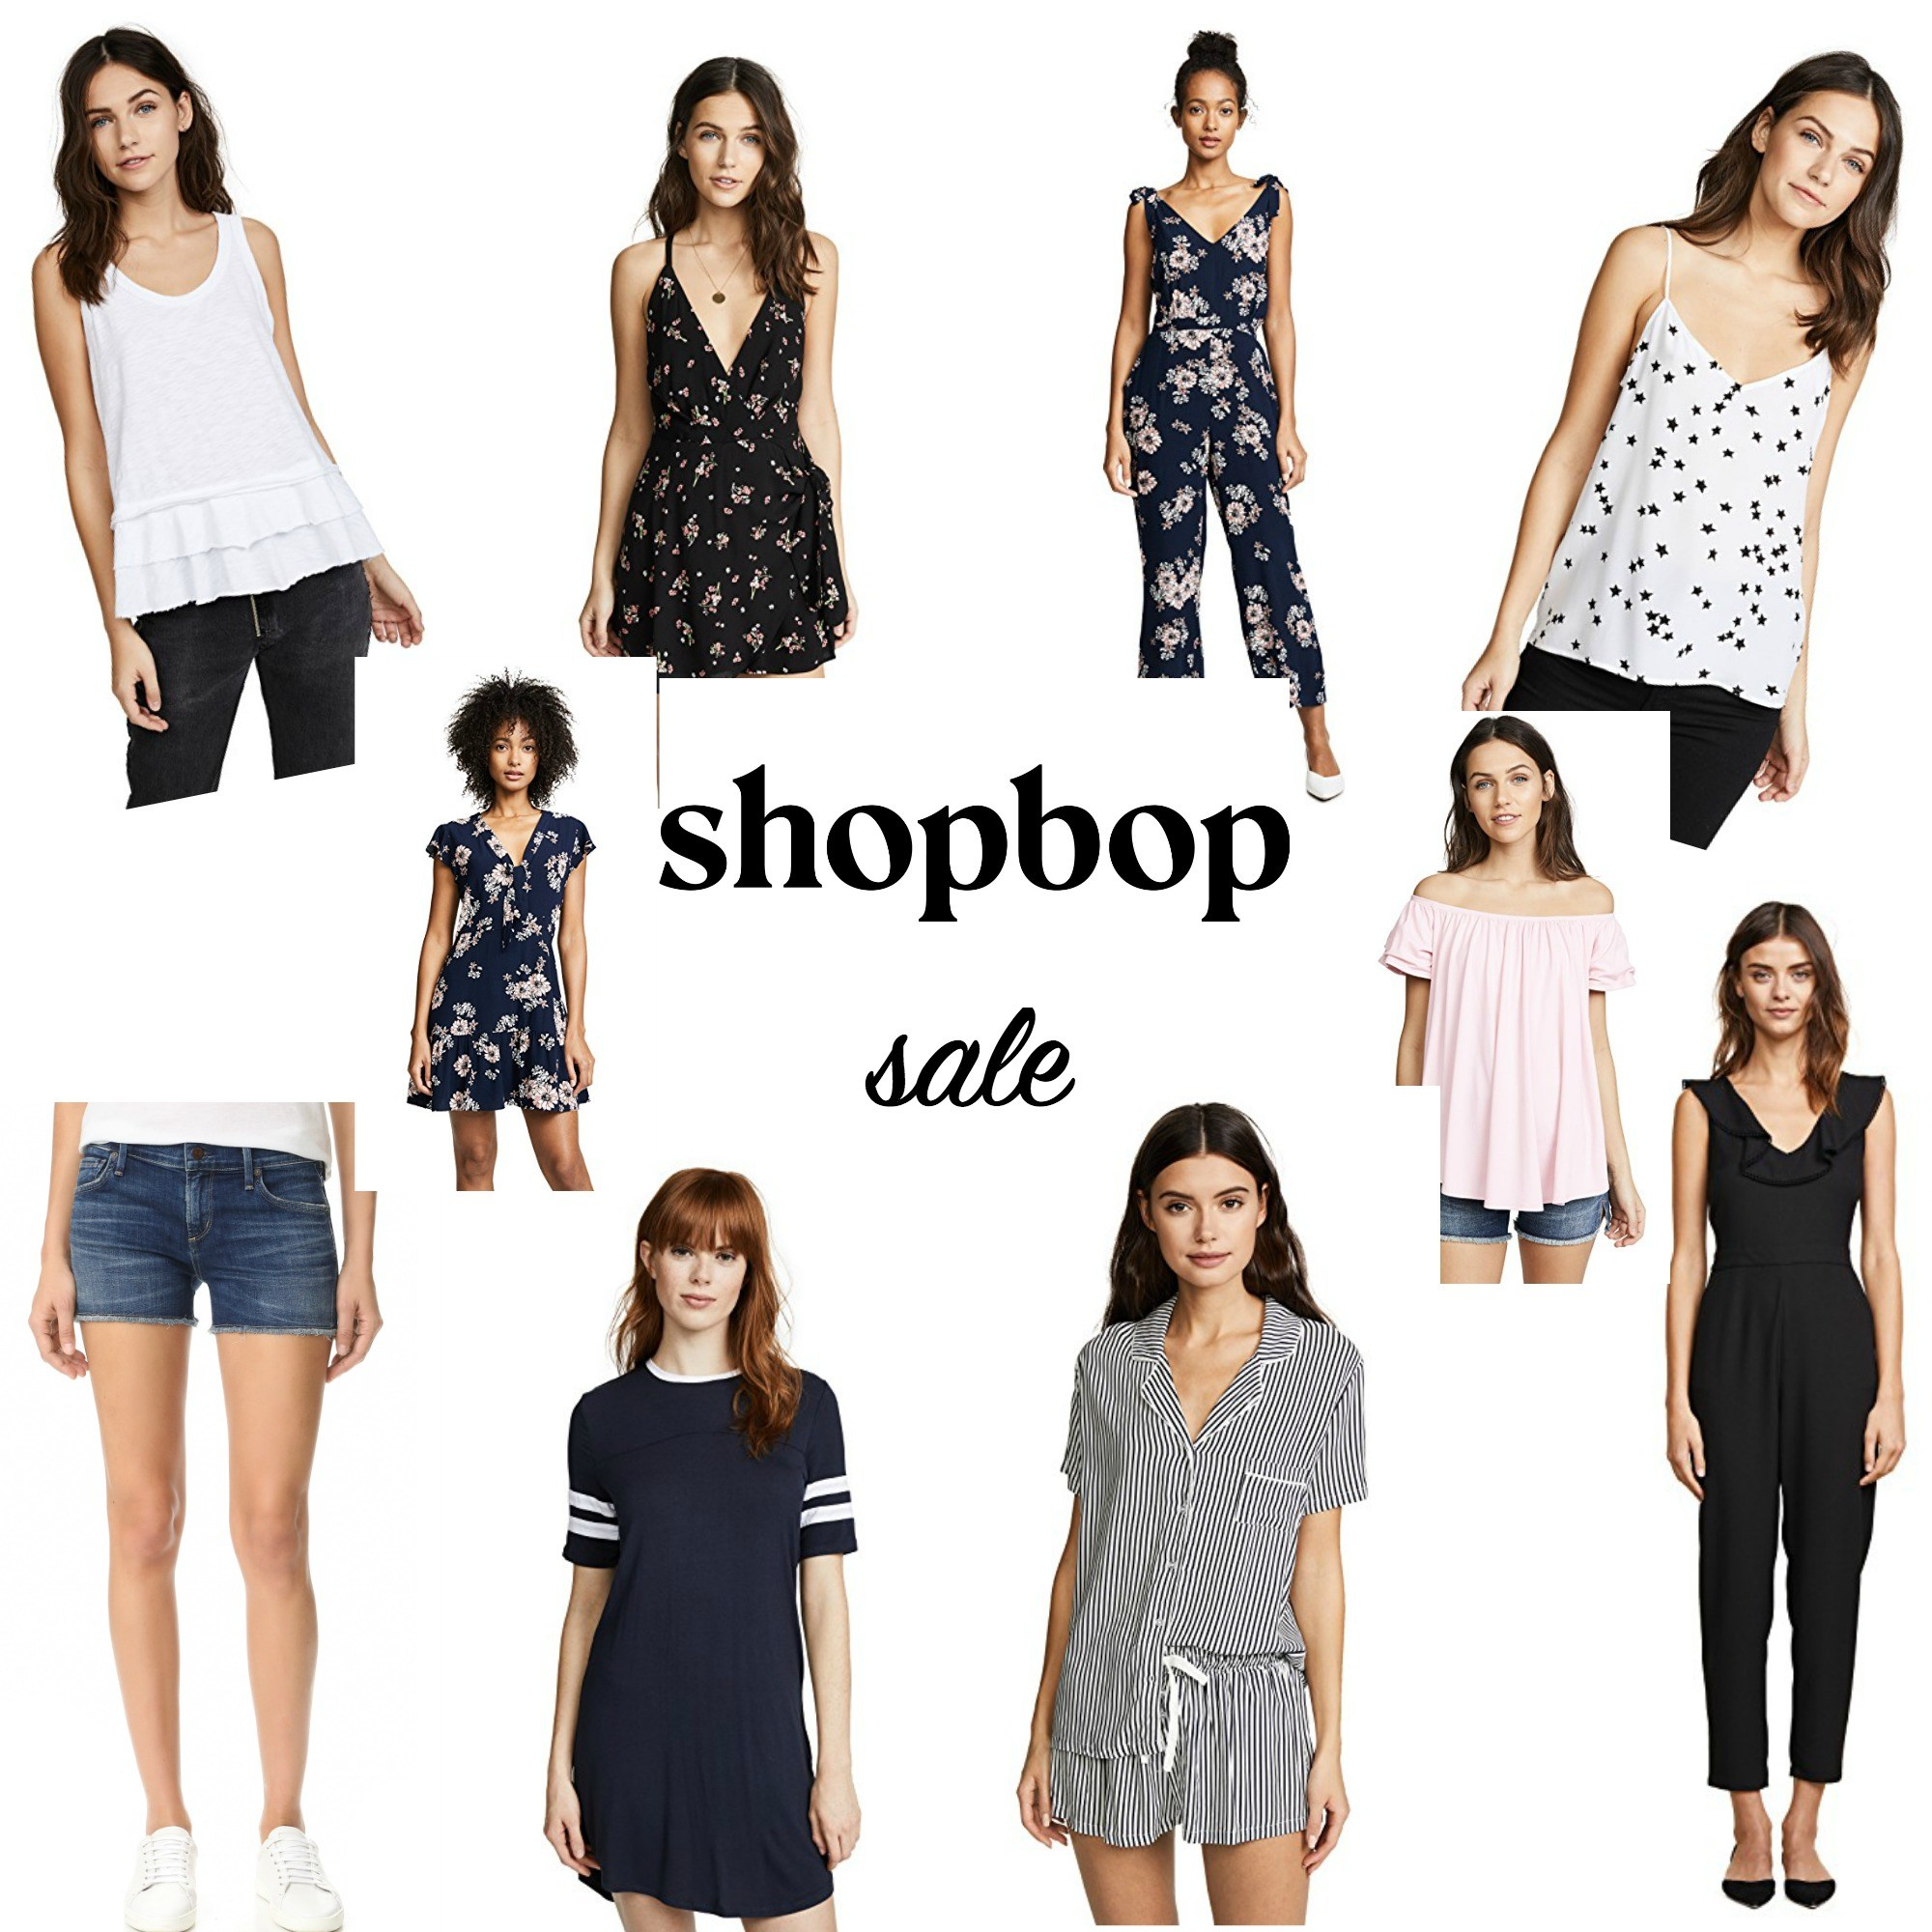 Shopbop Coupons